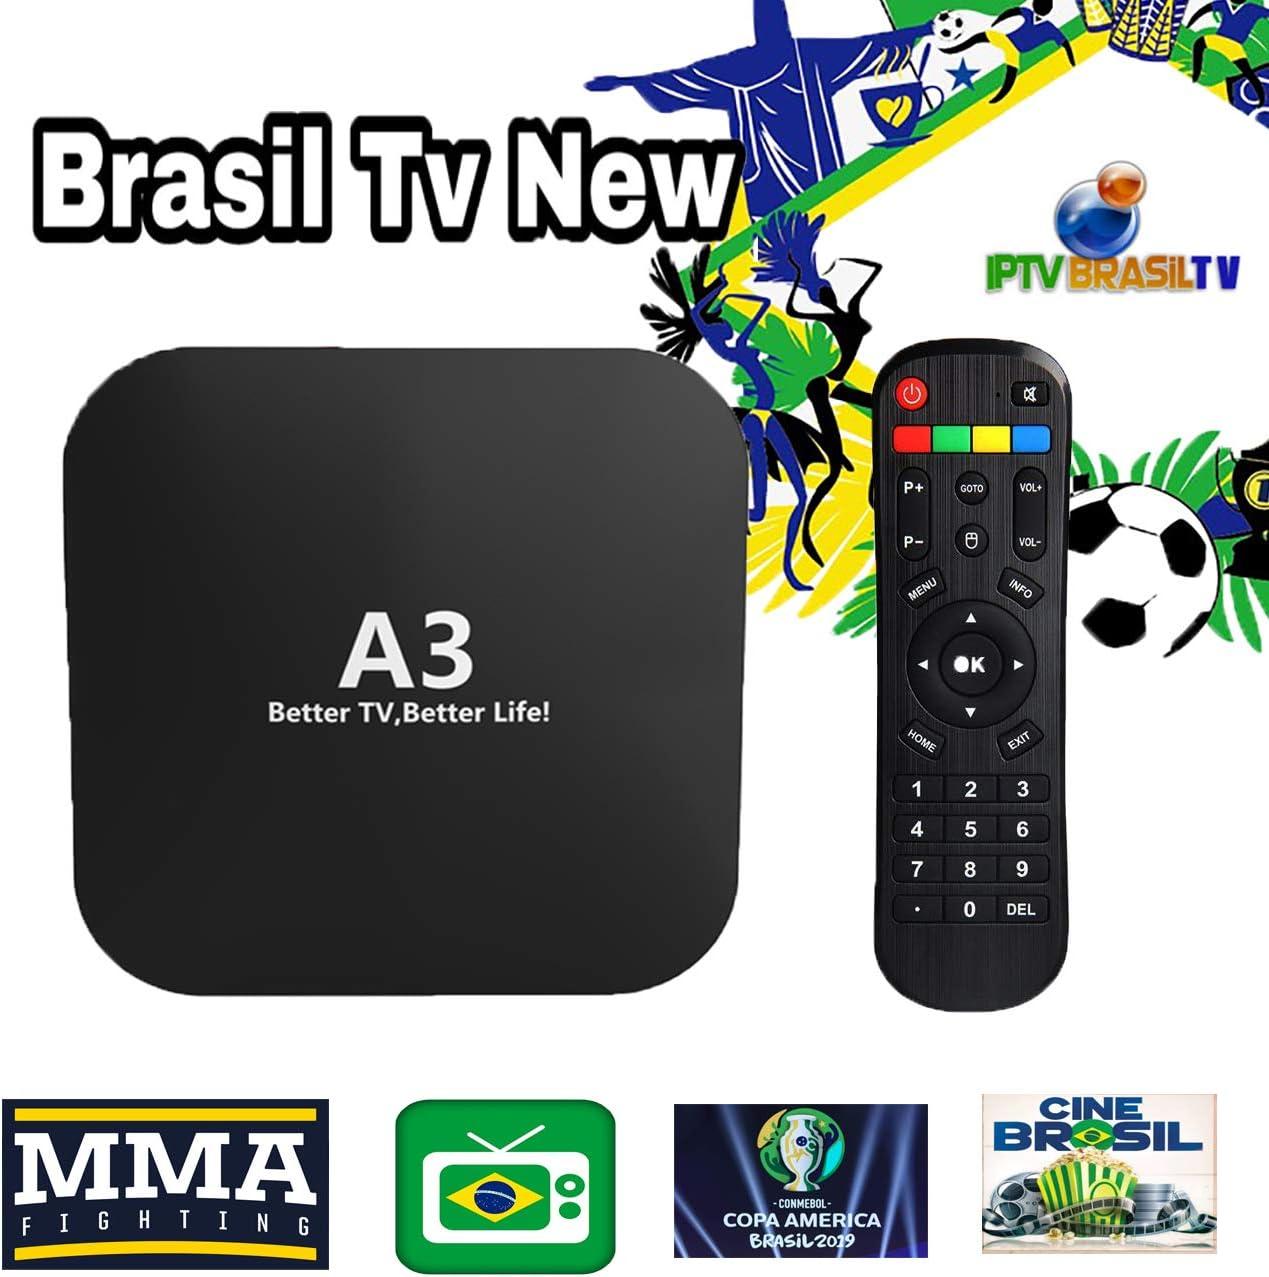 IPTV Brasil más Reciente A3 Box Update de A2 HTV 5 6 IPTV 5 6 Plus ...